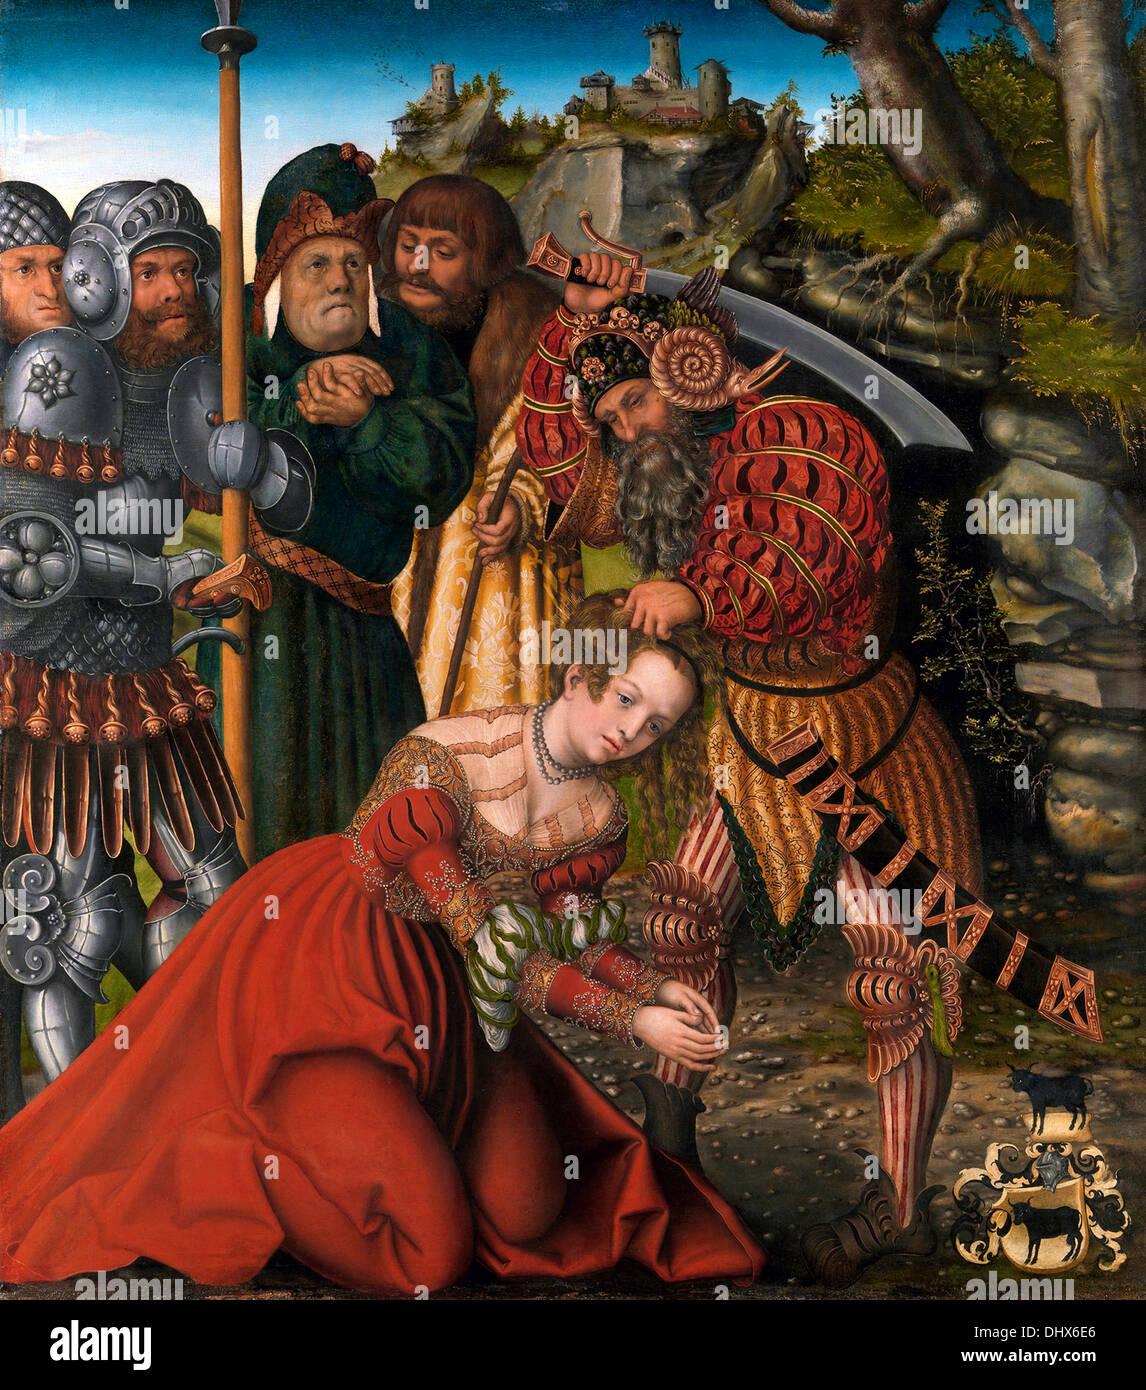 The Martyrdom of Saint Barbara - by Lucas Cranach the Elder 1510 - Stock Image